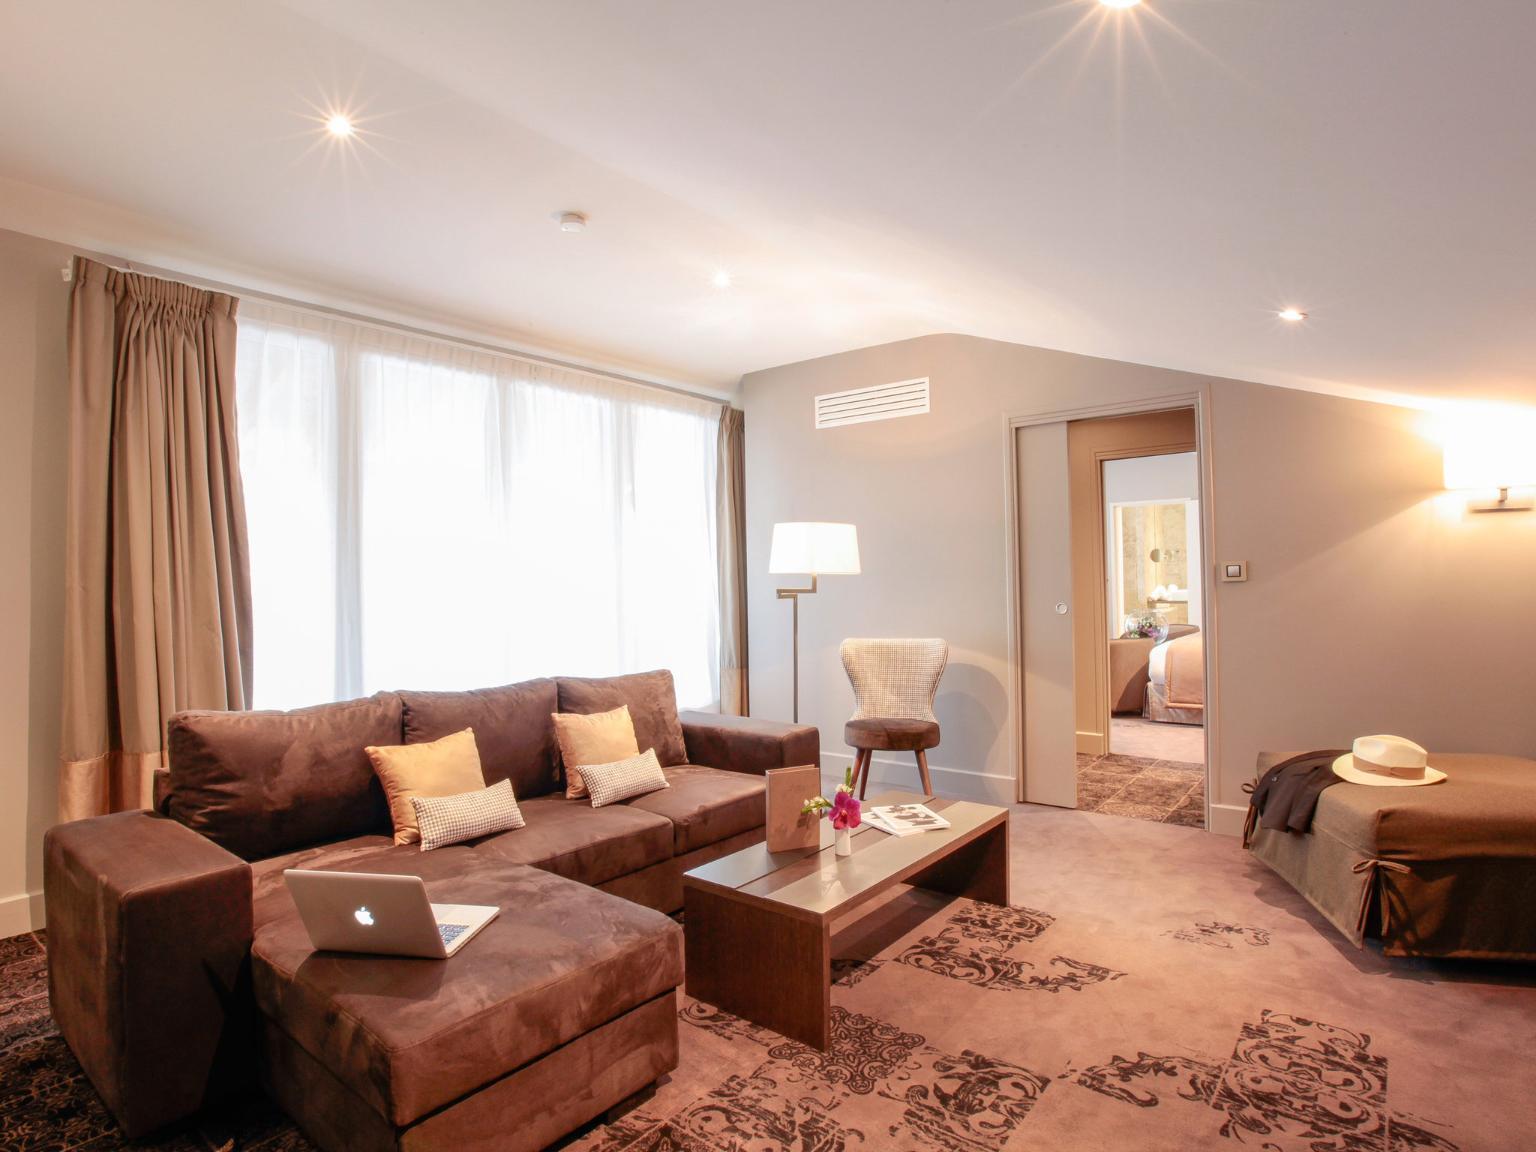 la cour des consuls h tel spa toulouse mgallery by sofitel h tel 46 rue des couteliers. Black Bedroom Furniture Sets. Home Design Ideas